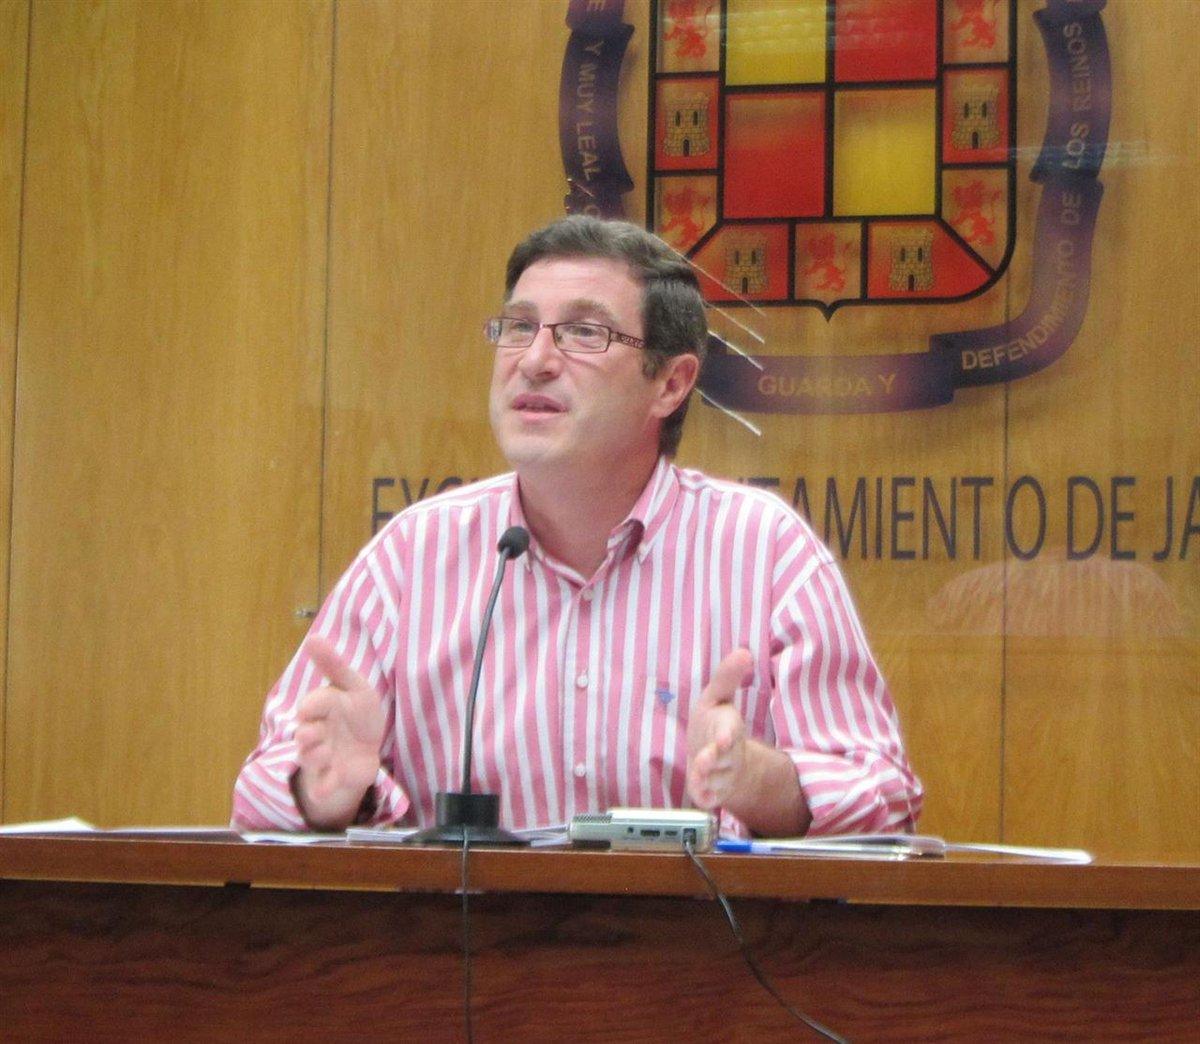 EXCLUSIVA: Piden que se cite a declarar como investigado a Miguel Contreras (@_mcontreras). https://t.co/iVBnuvFSjf https://t.co/2dX7twKr41